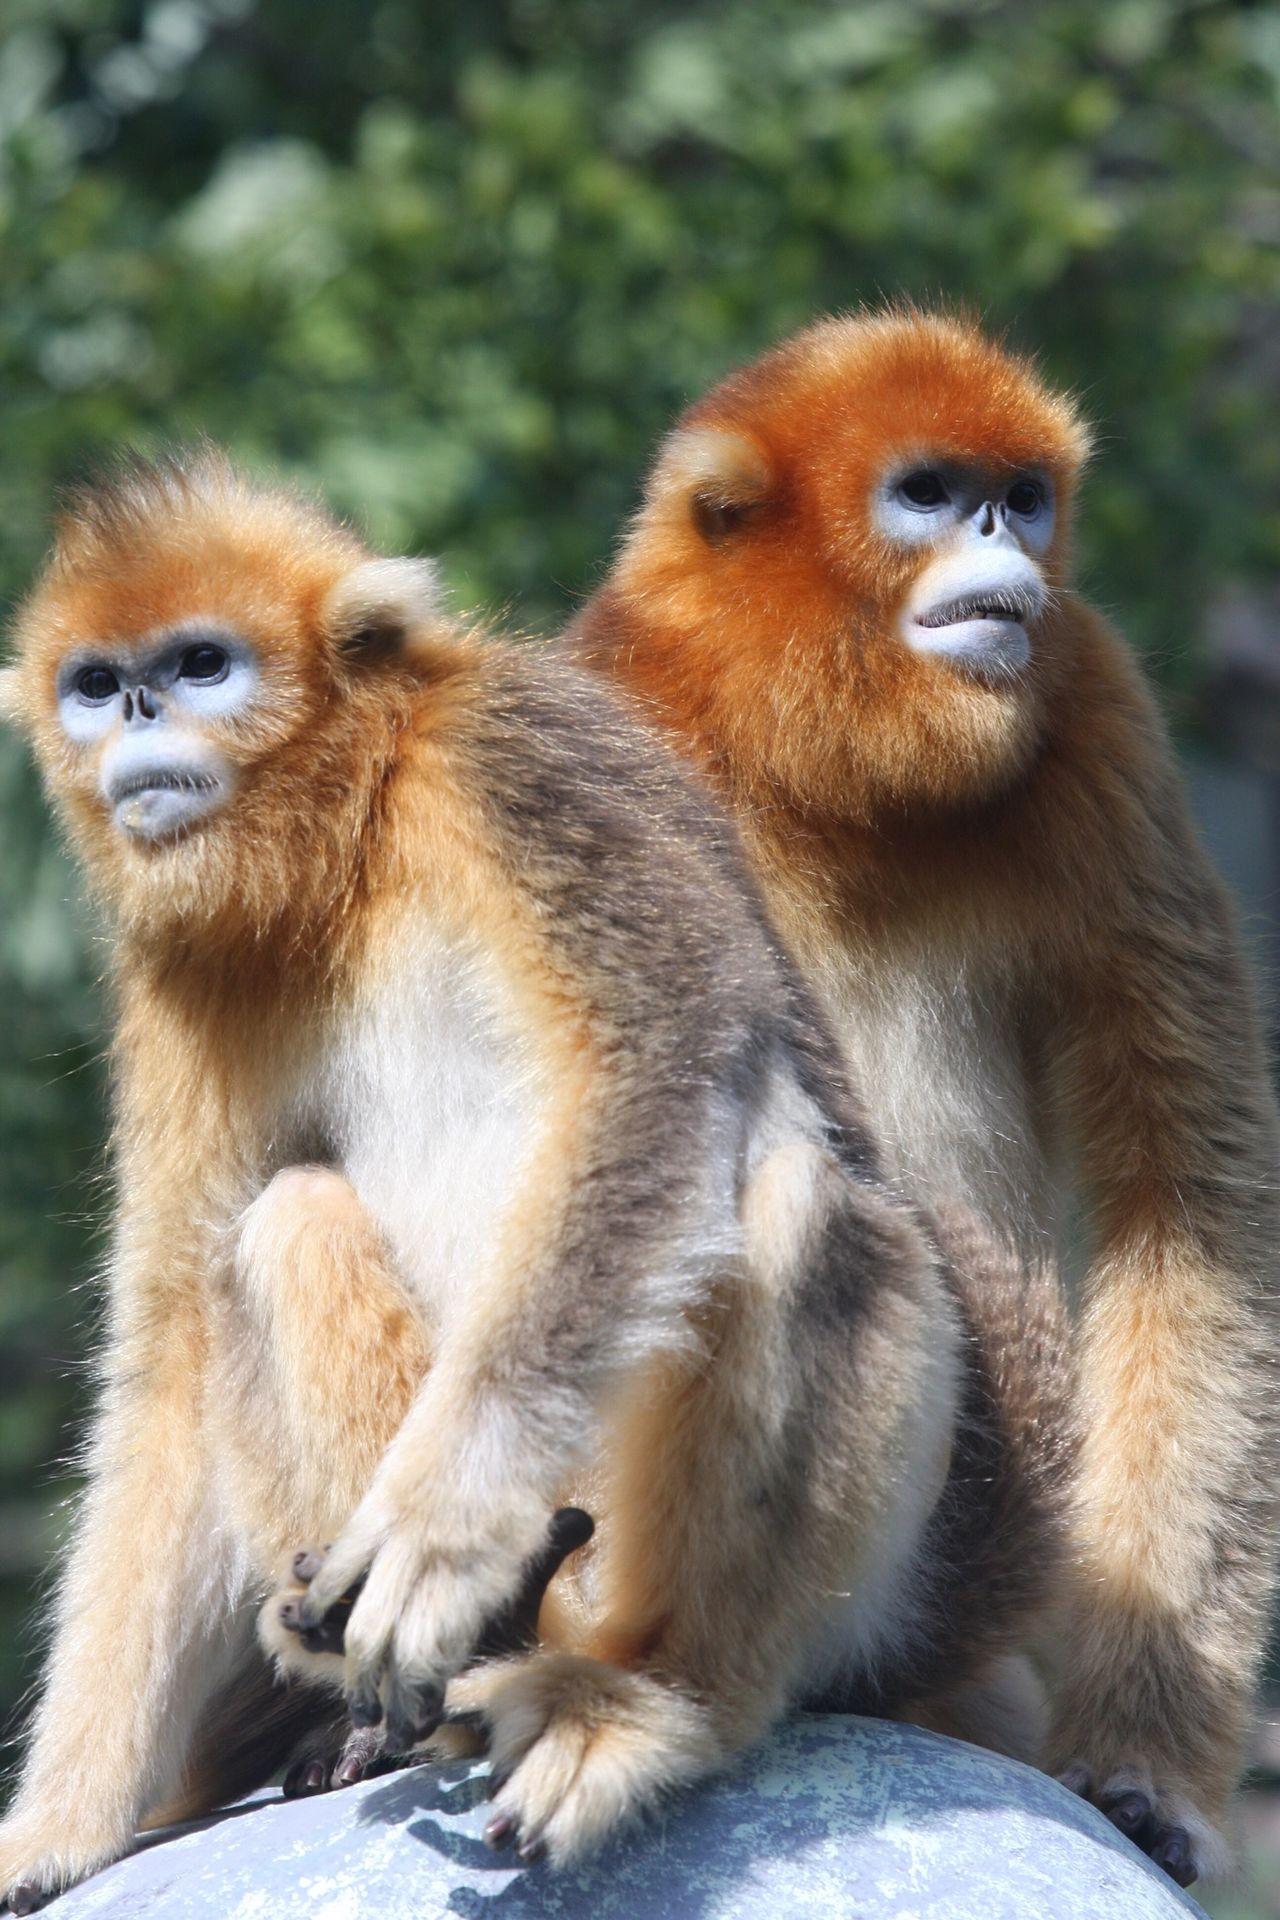 MonkeyYear2016 Safari Park Golden Monkey Animals